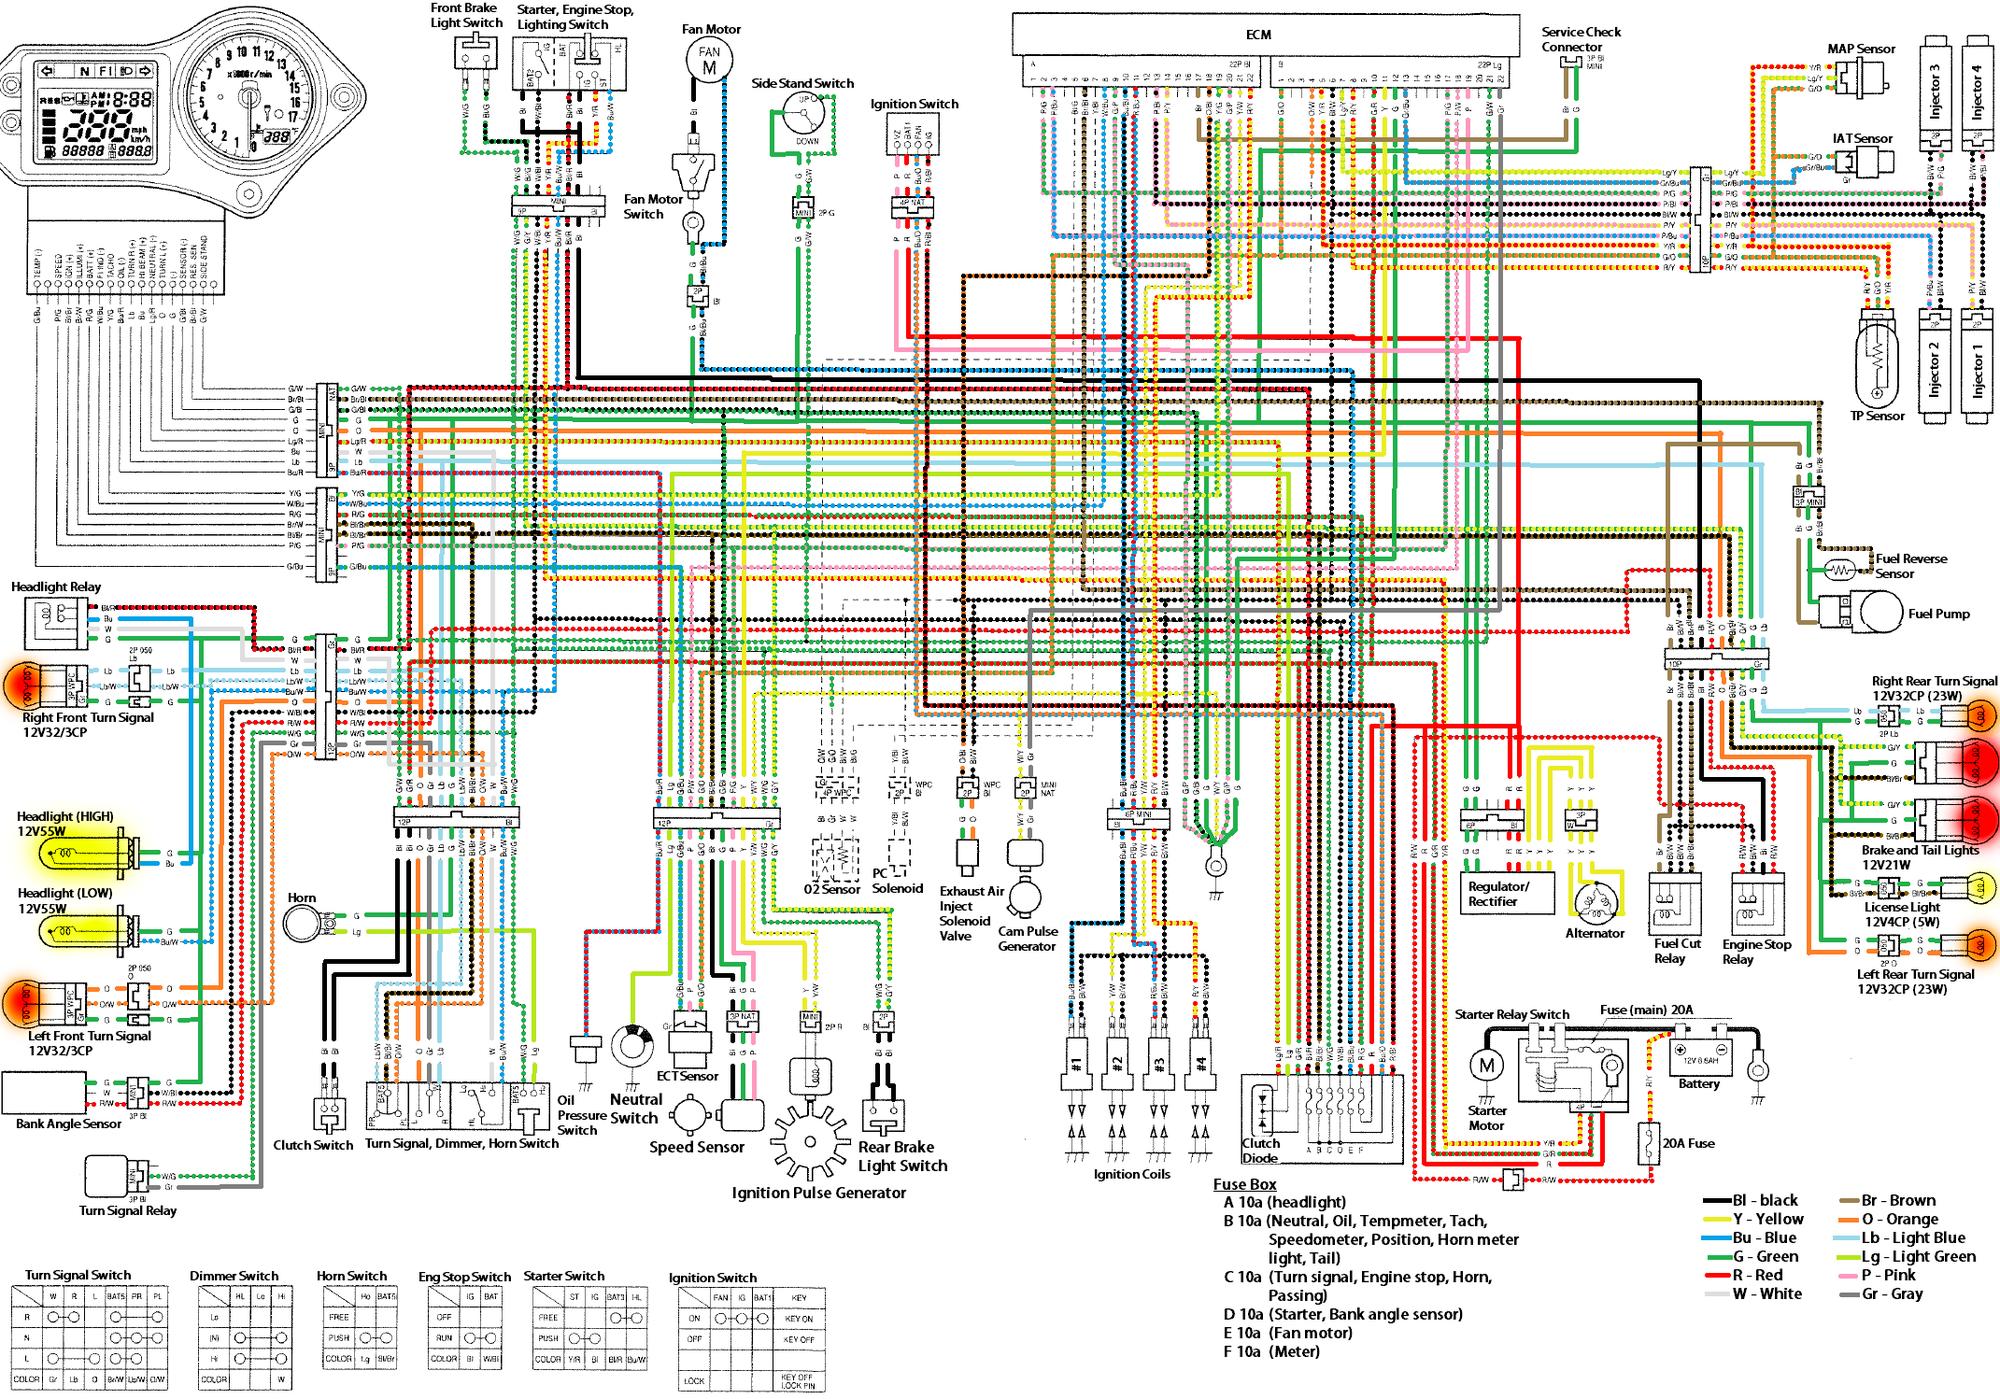 honda cbr engine diagram - wiring diagram base line - line.jabstudio.it  jab studio